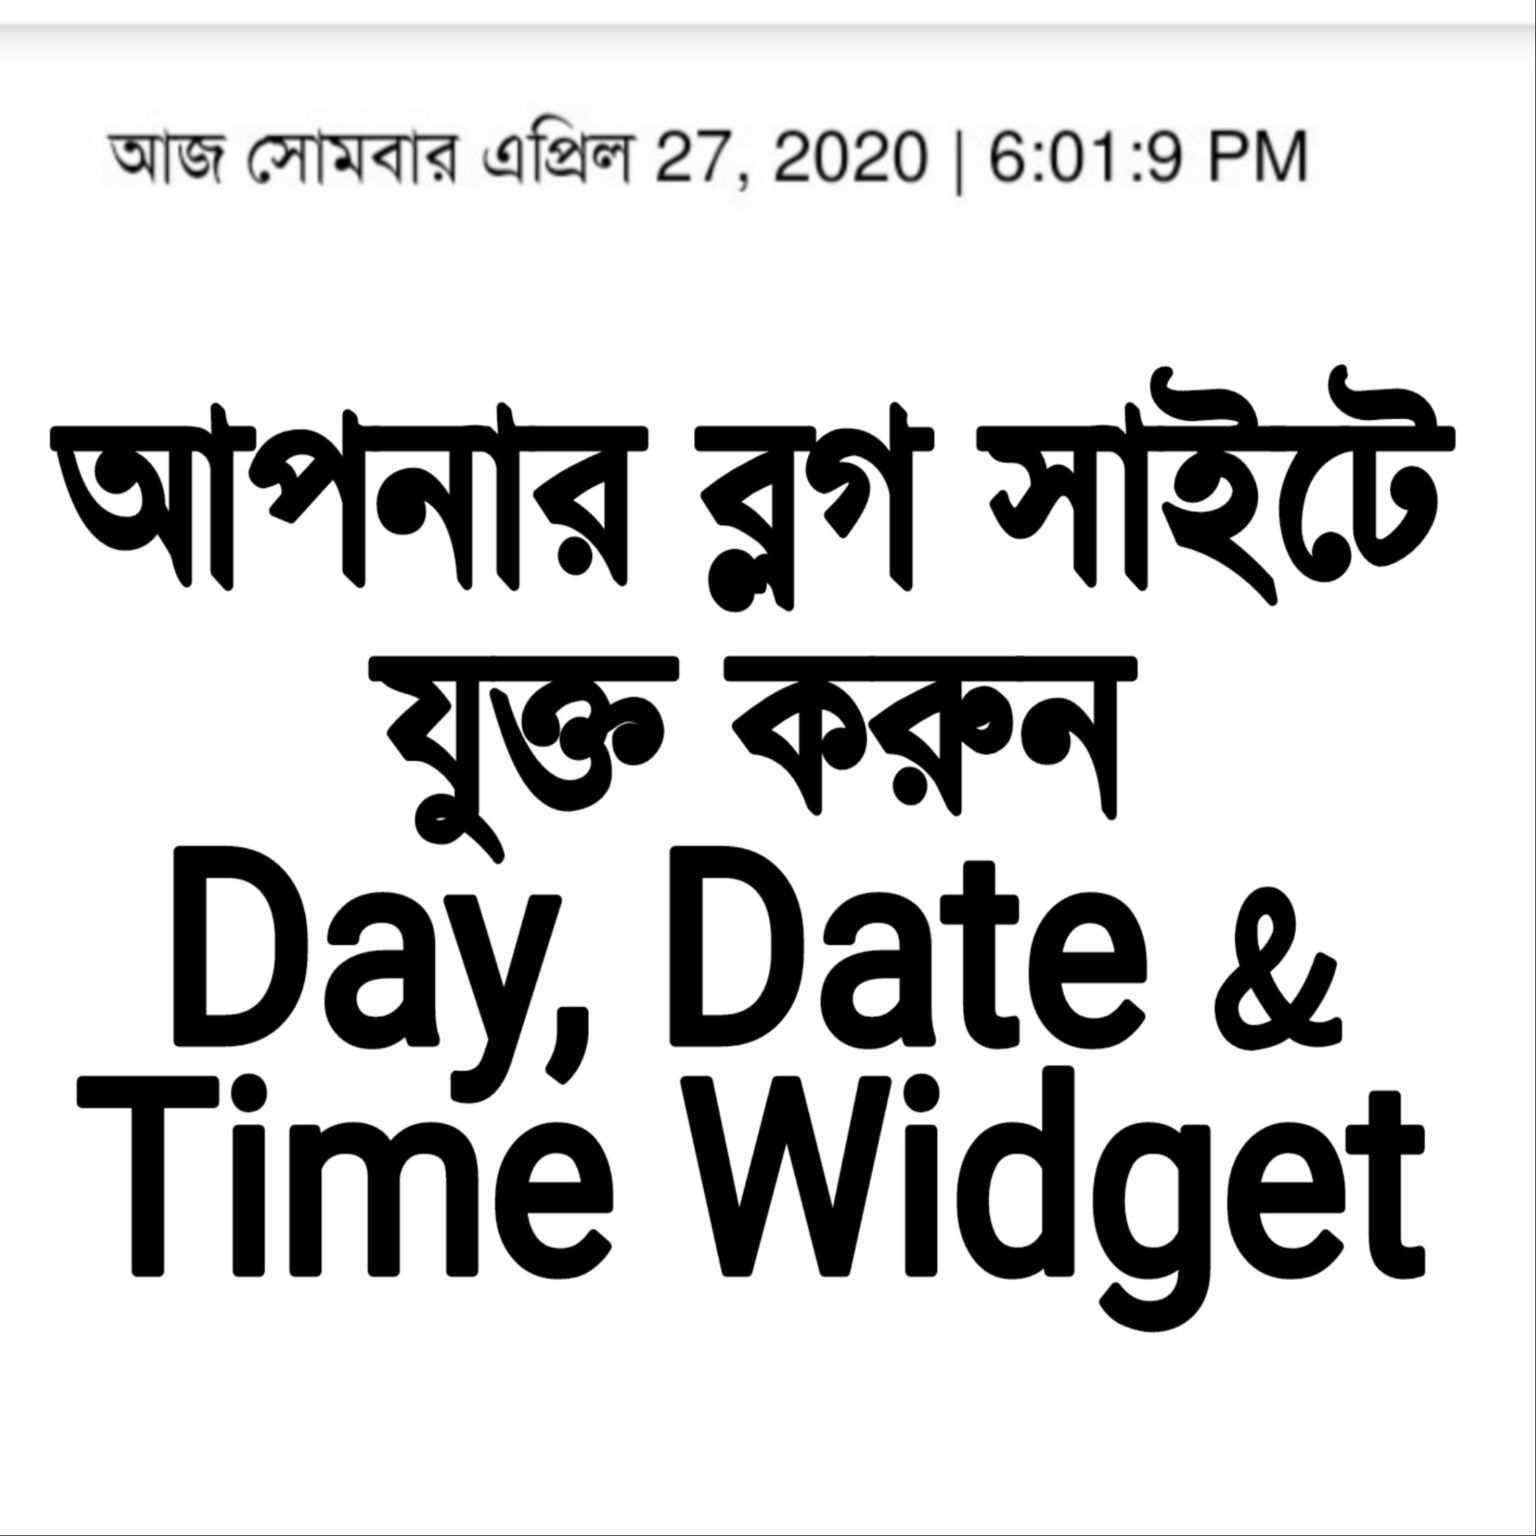 [Blogger] আপনার ব্লগে যোগ করে নিন Day, Date, Time Widget | নতুনদের জন্য